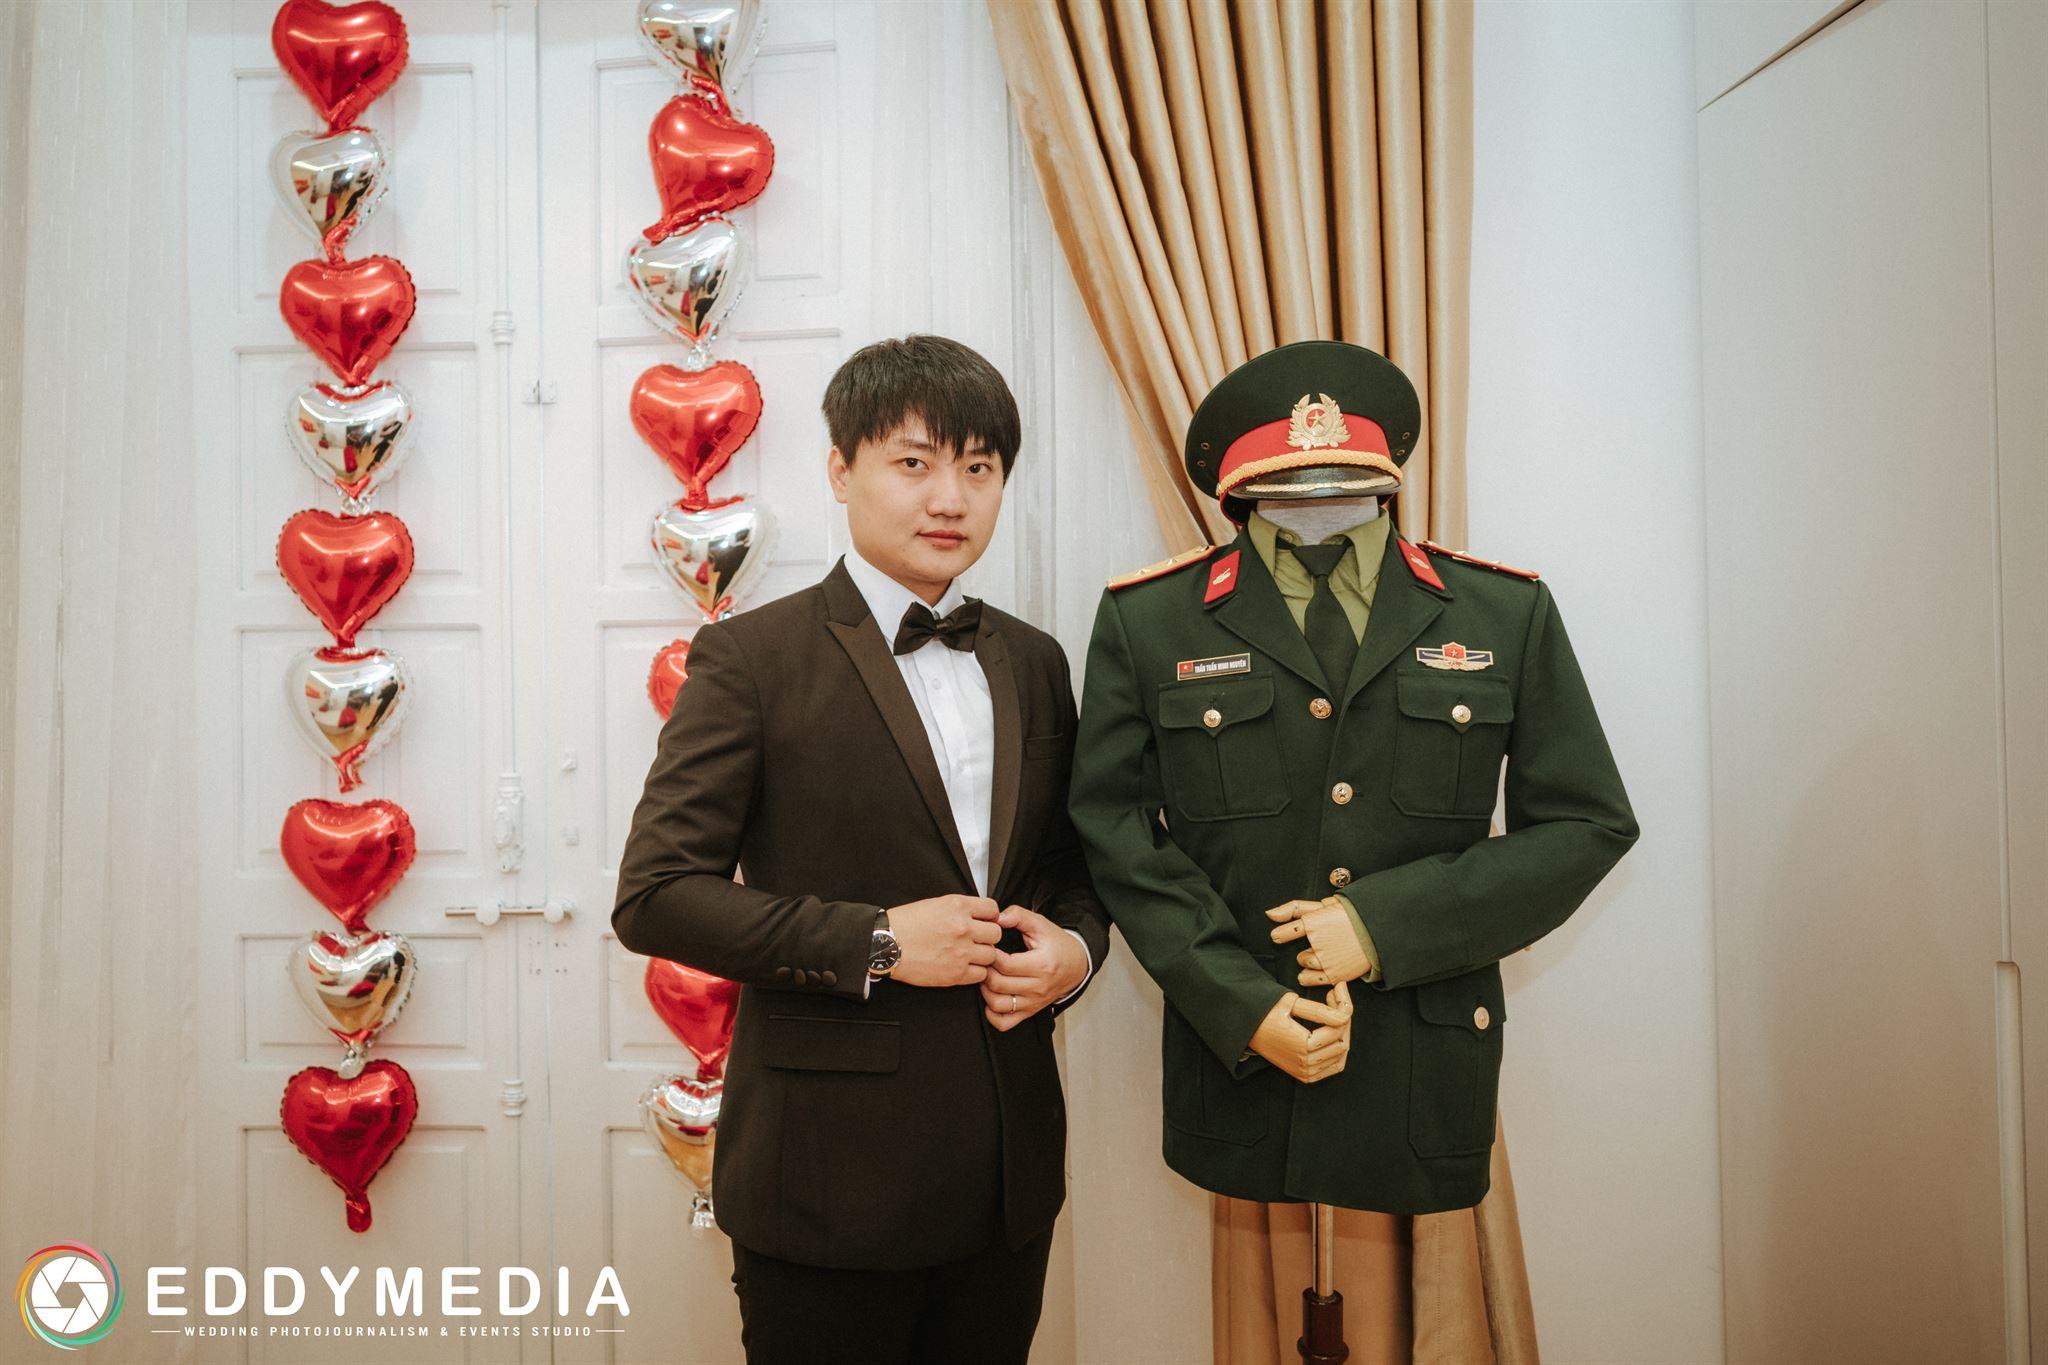 MinhNguyen KimThanh EddyMedia 4 lấy vợ giàu